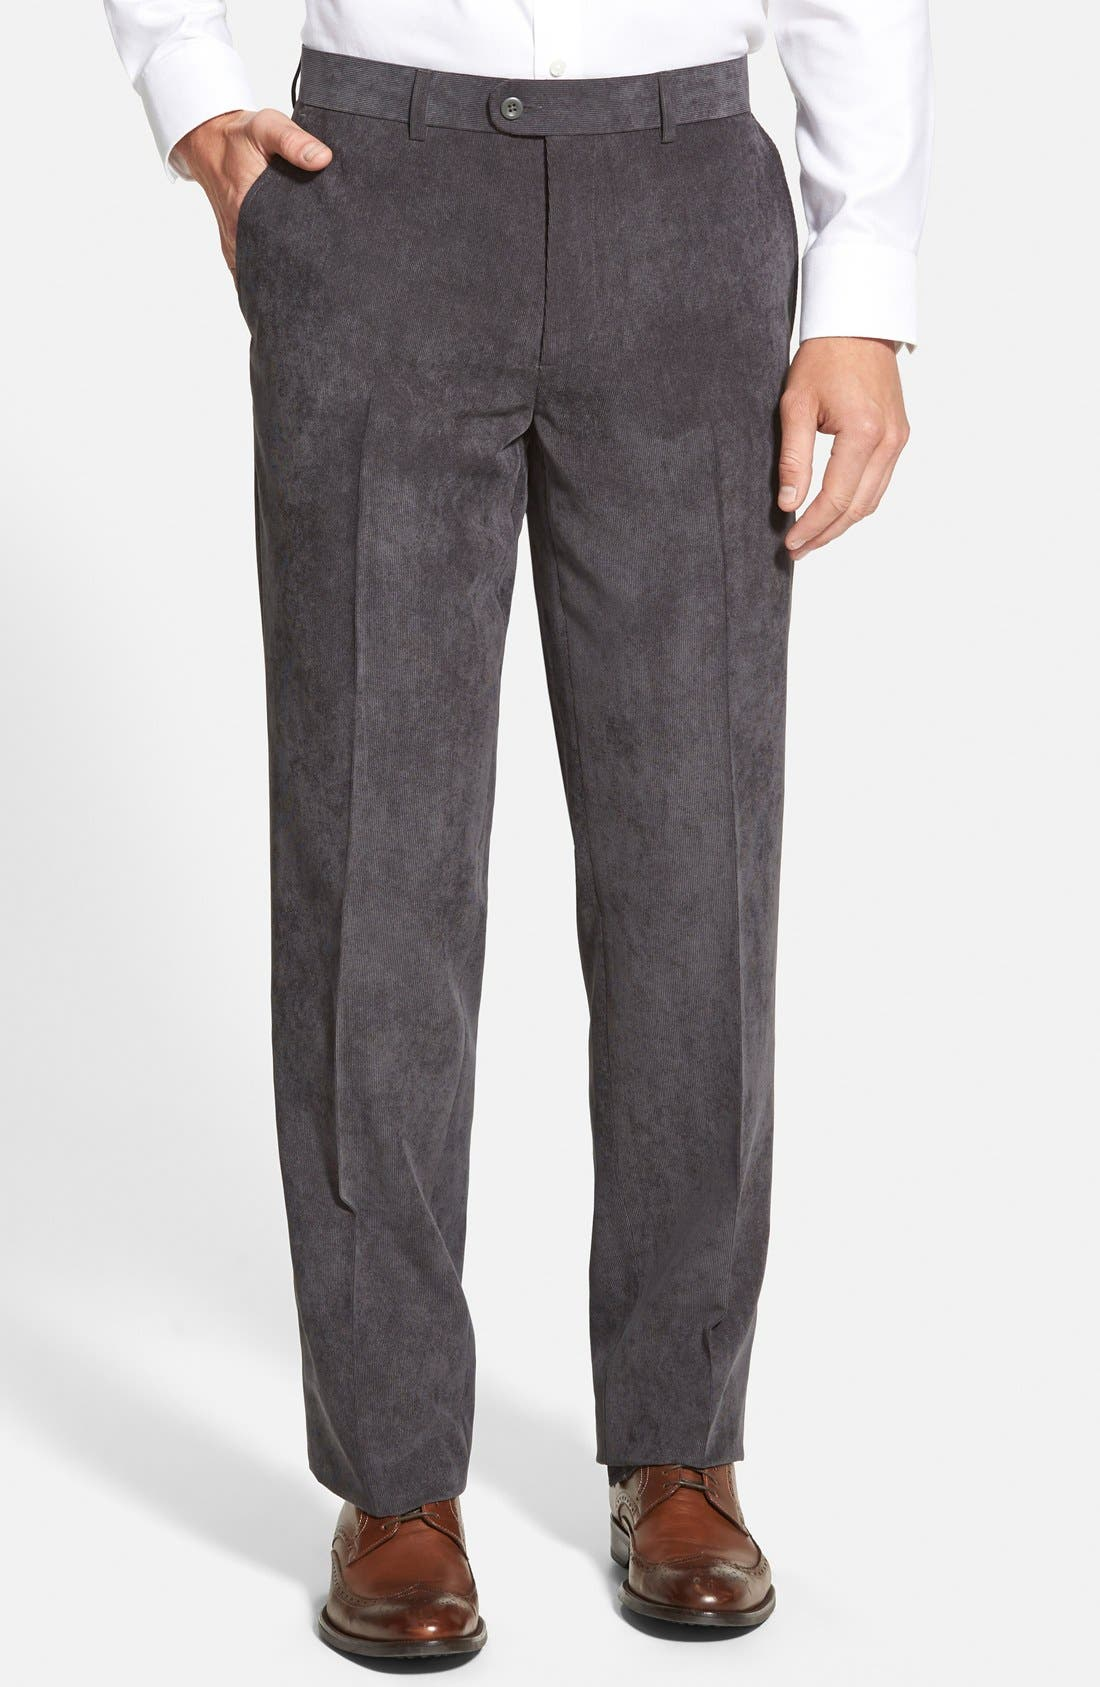 'Micro Air' Wrinkle Resistant Microfiber Corduroy Pants,                         Main,                         color, 023